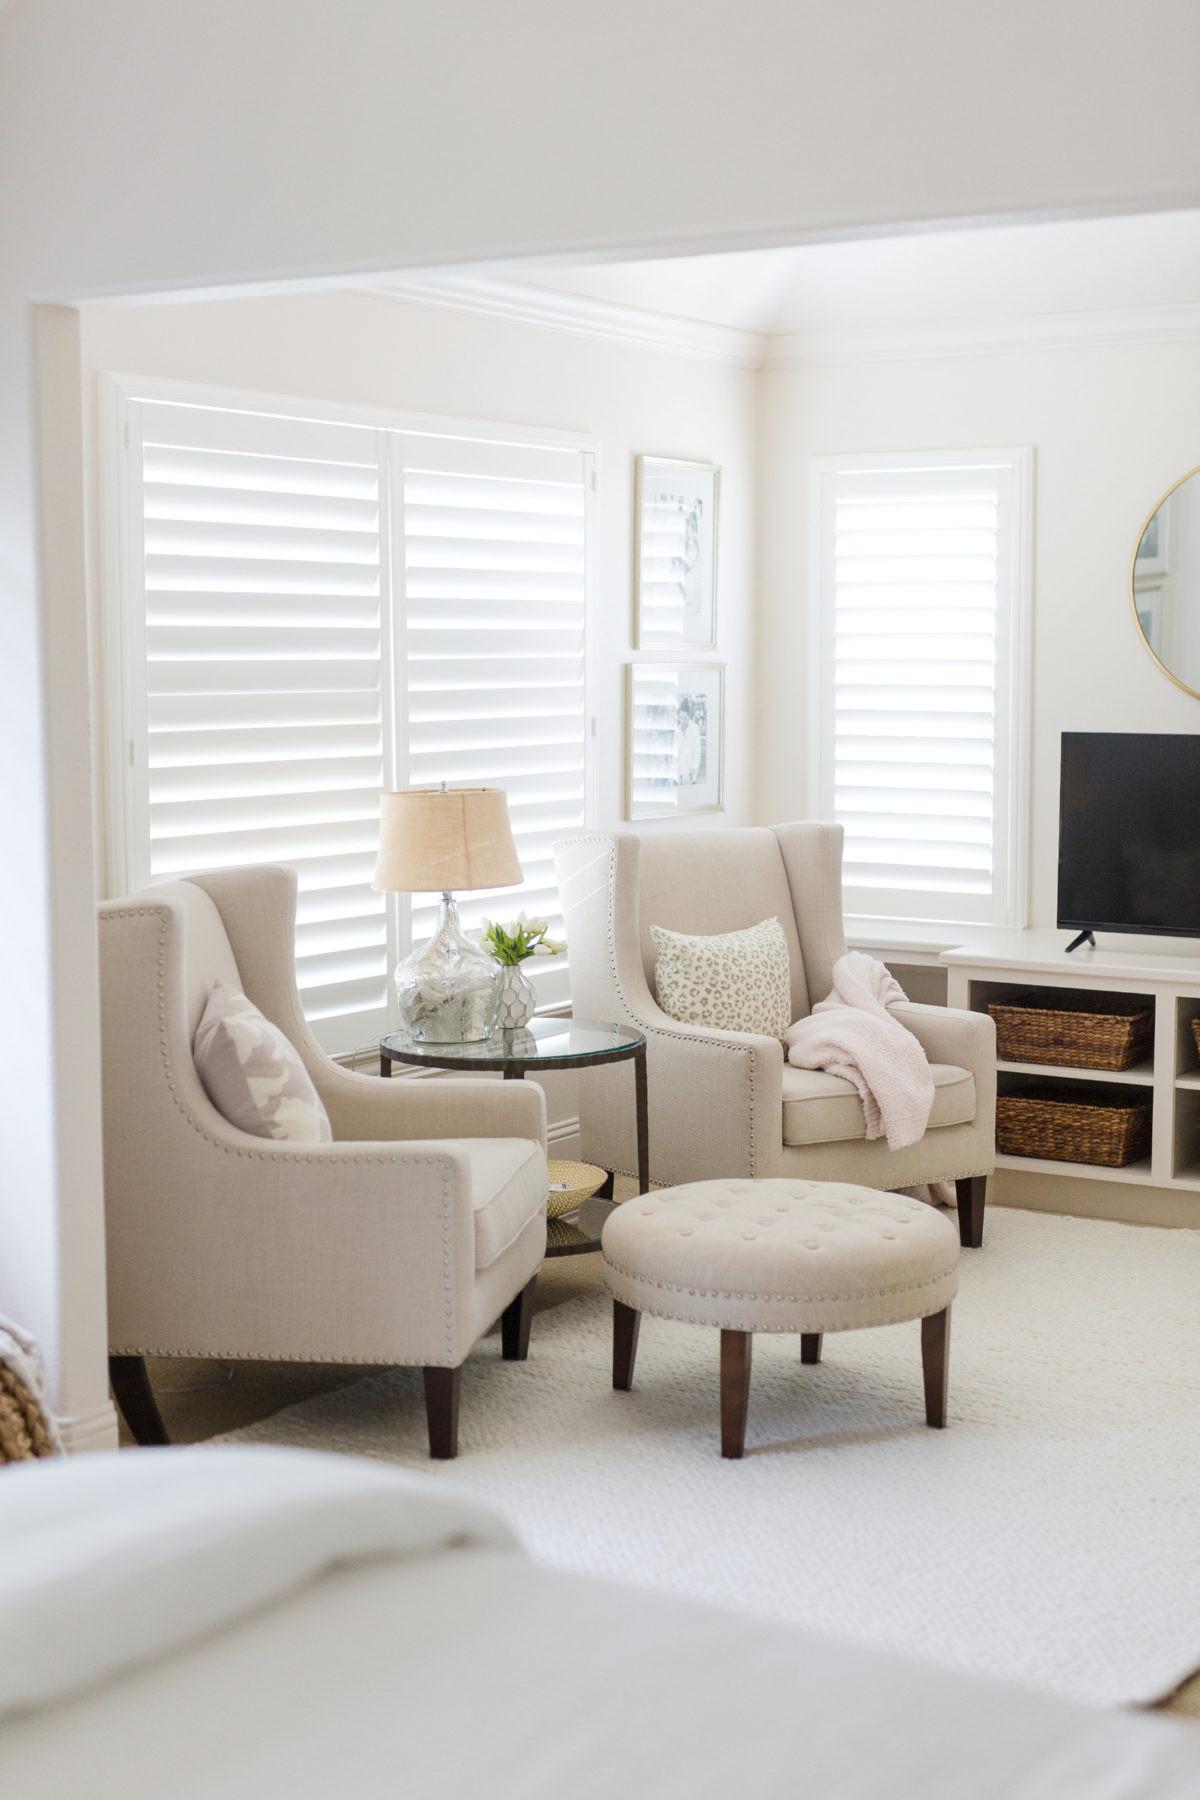 Master Bedroom Sitting area Best Of Master Bedroom Sitting area Update